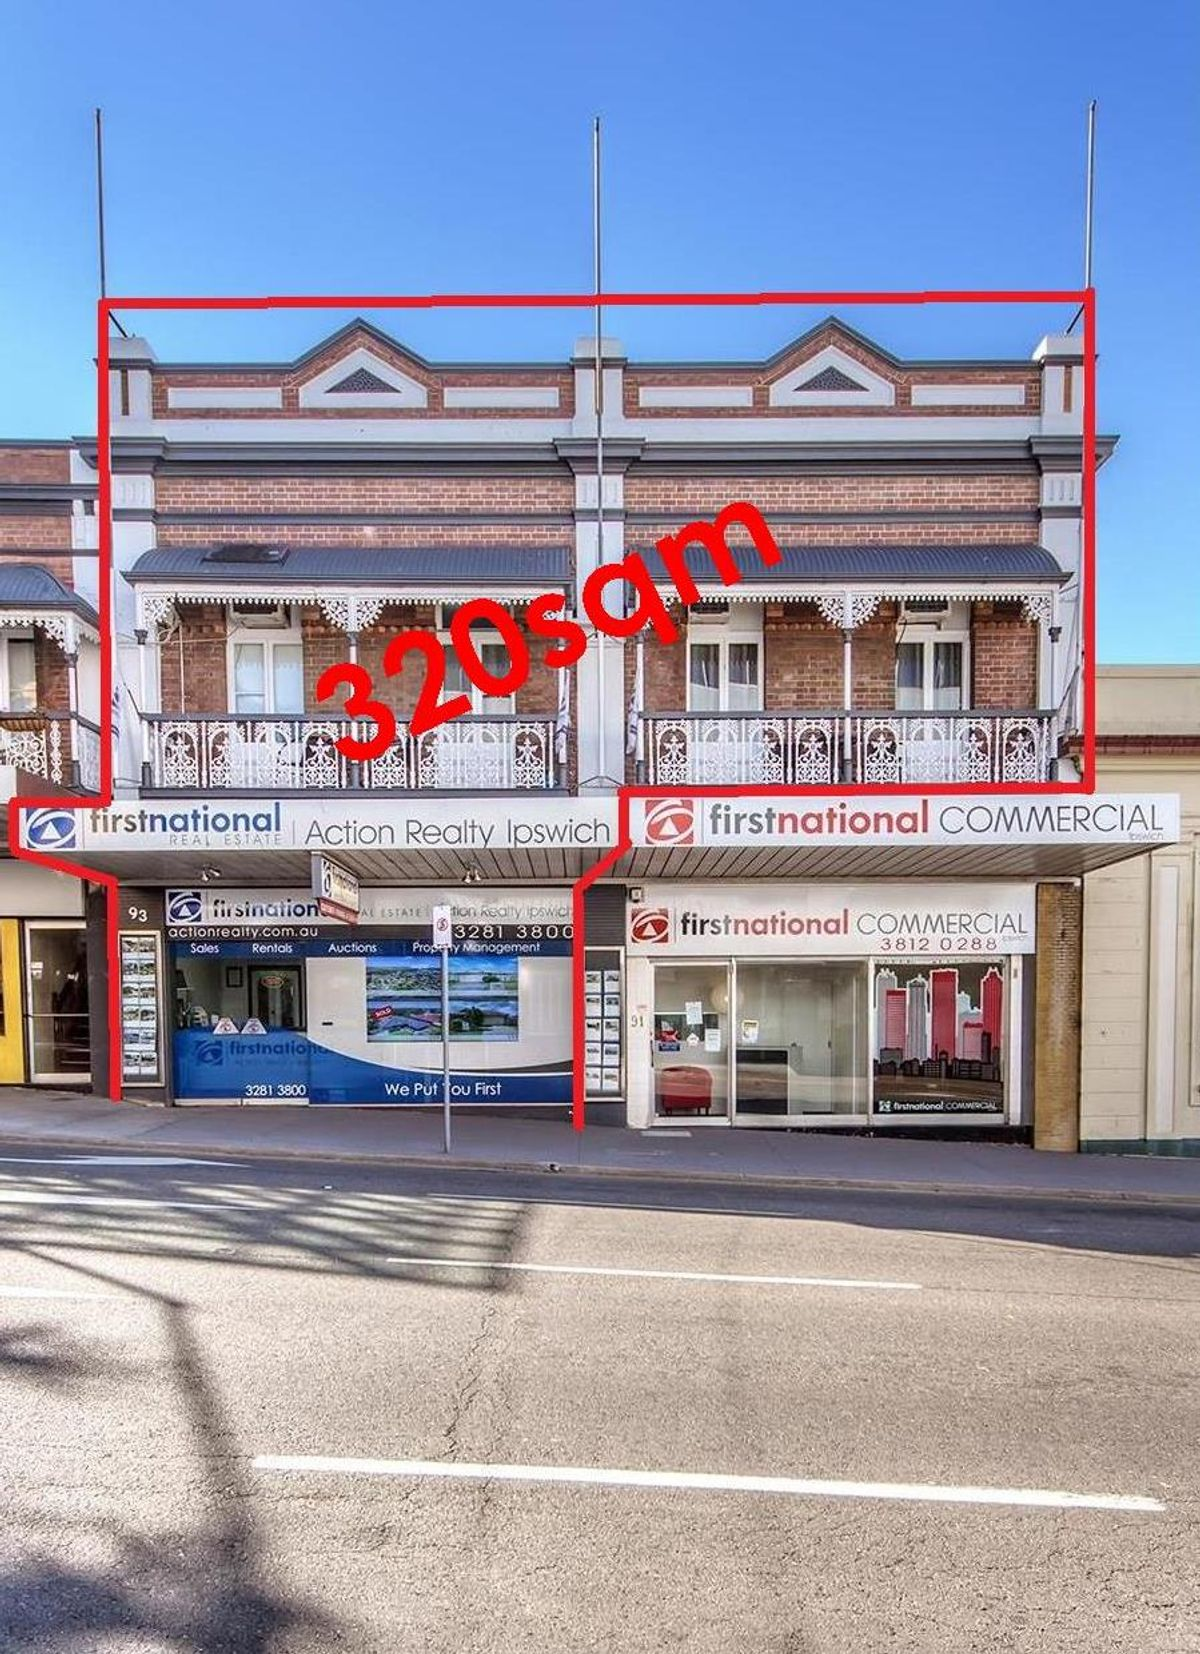 93 Brisbane Street, Ipswich, QLD 4305